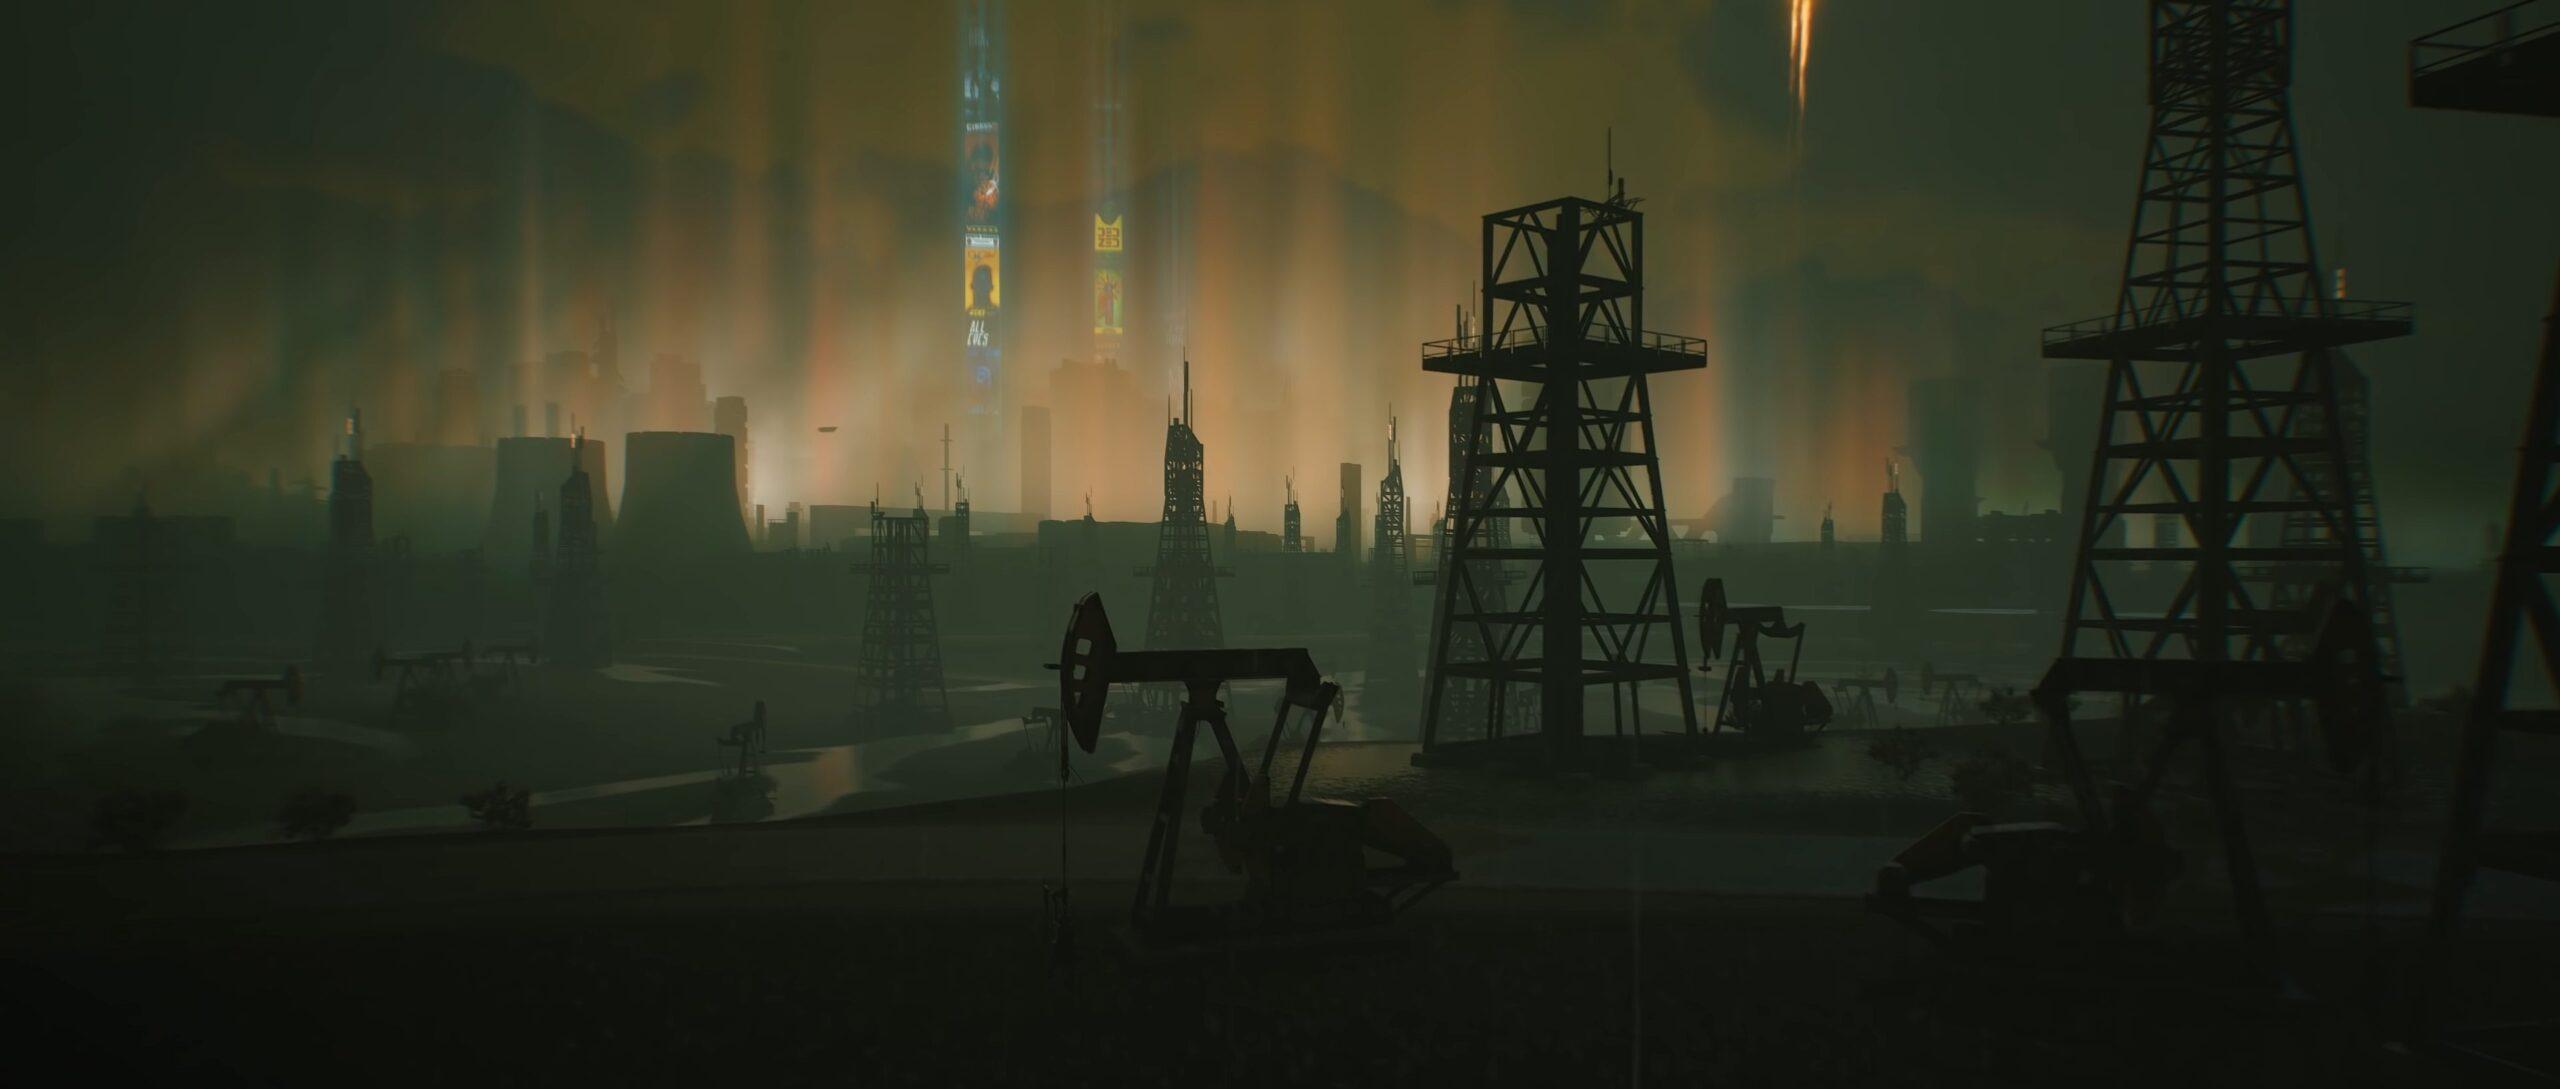 Cyberpunk 2077 interview inspiration night city